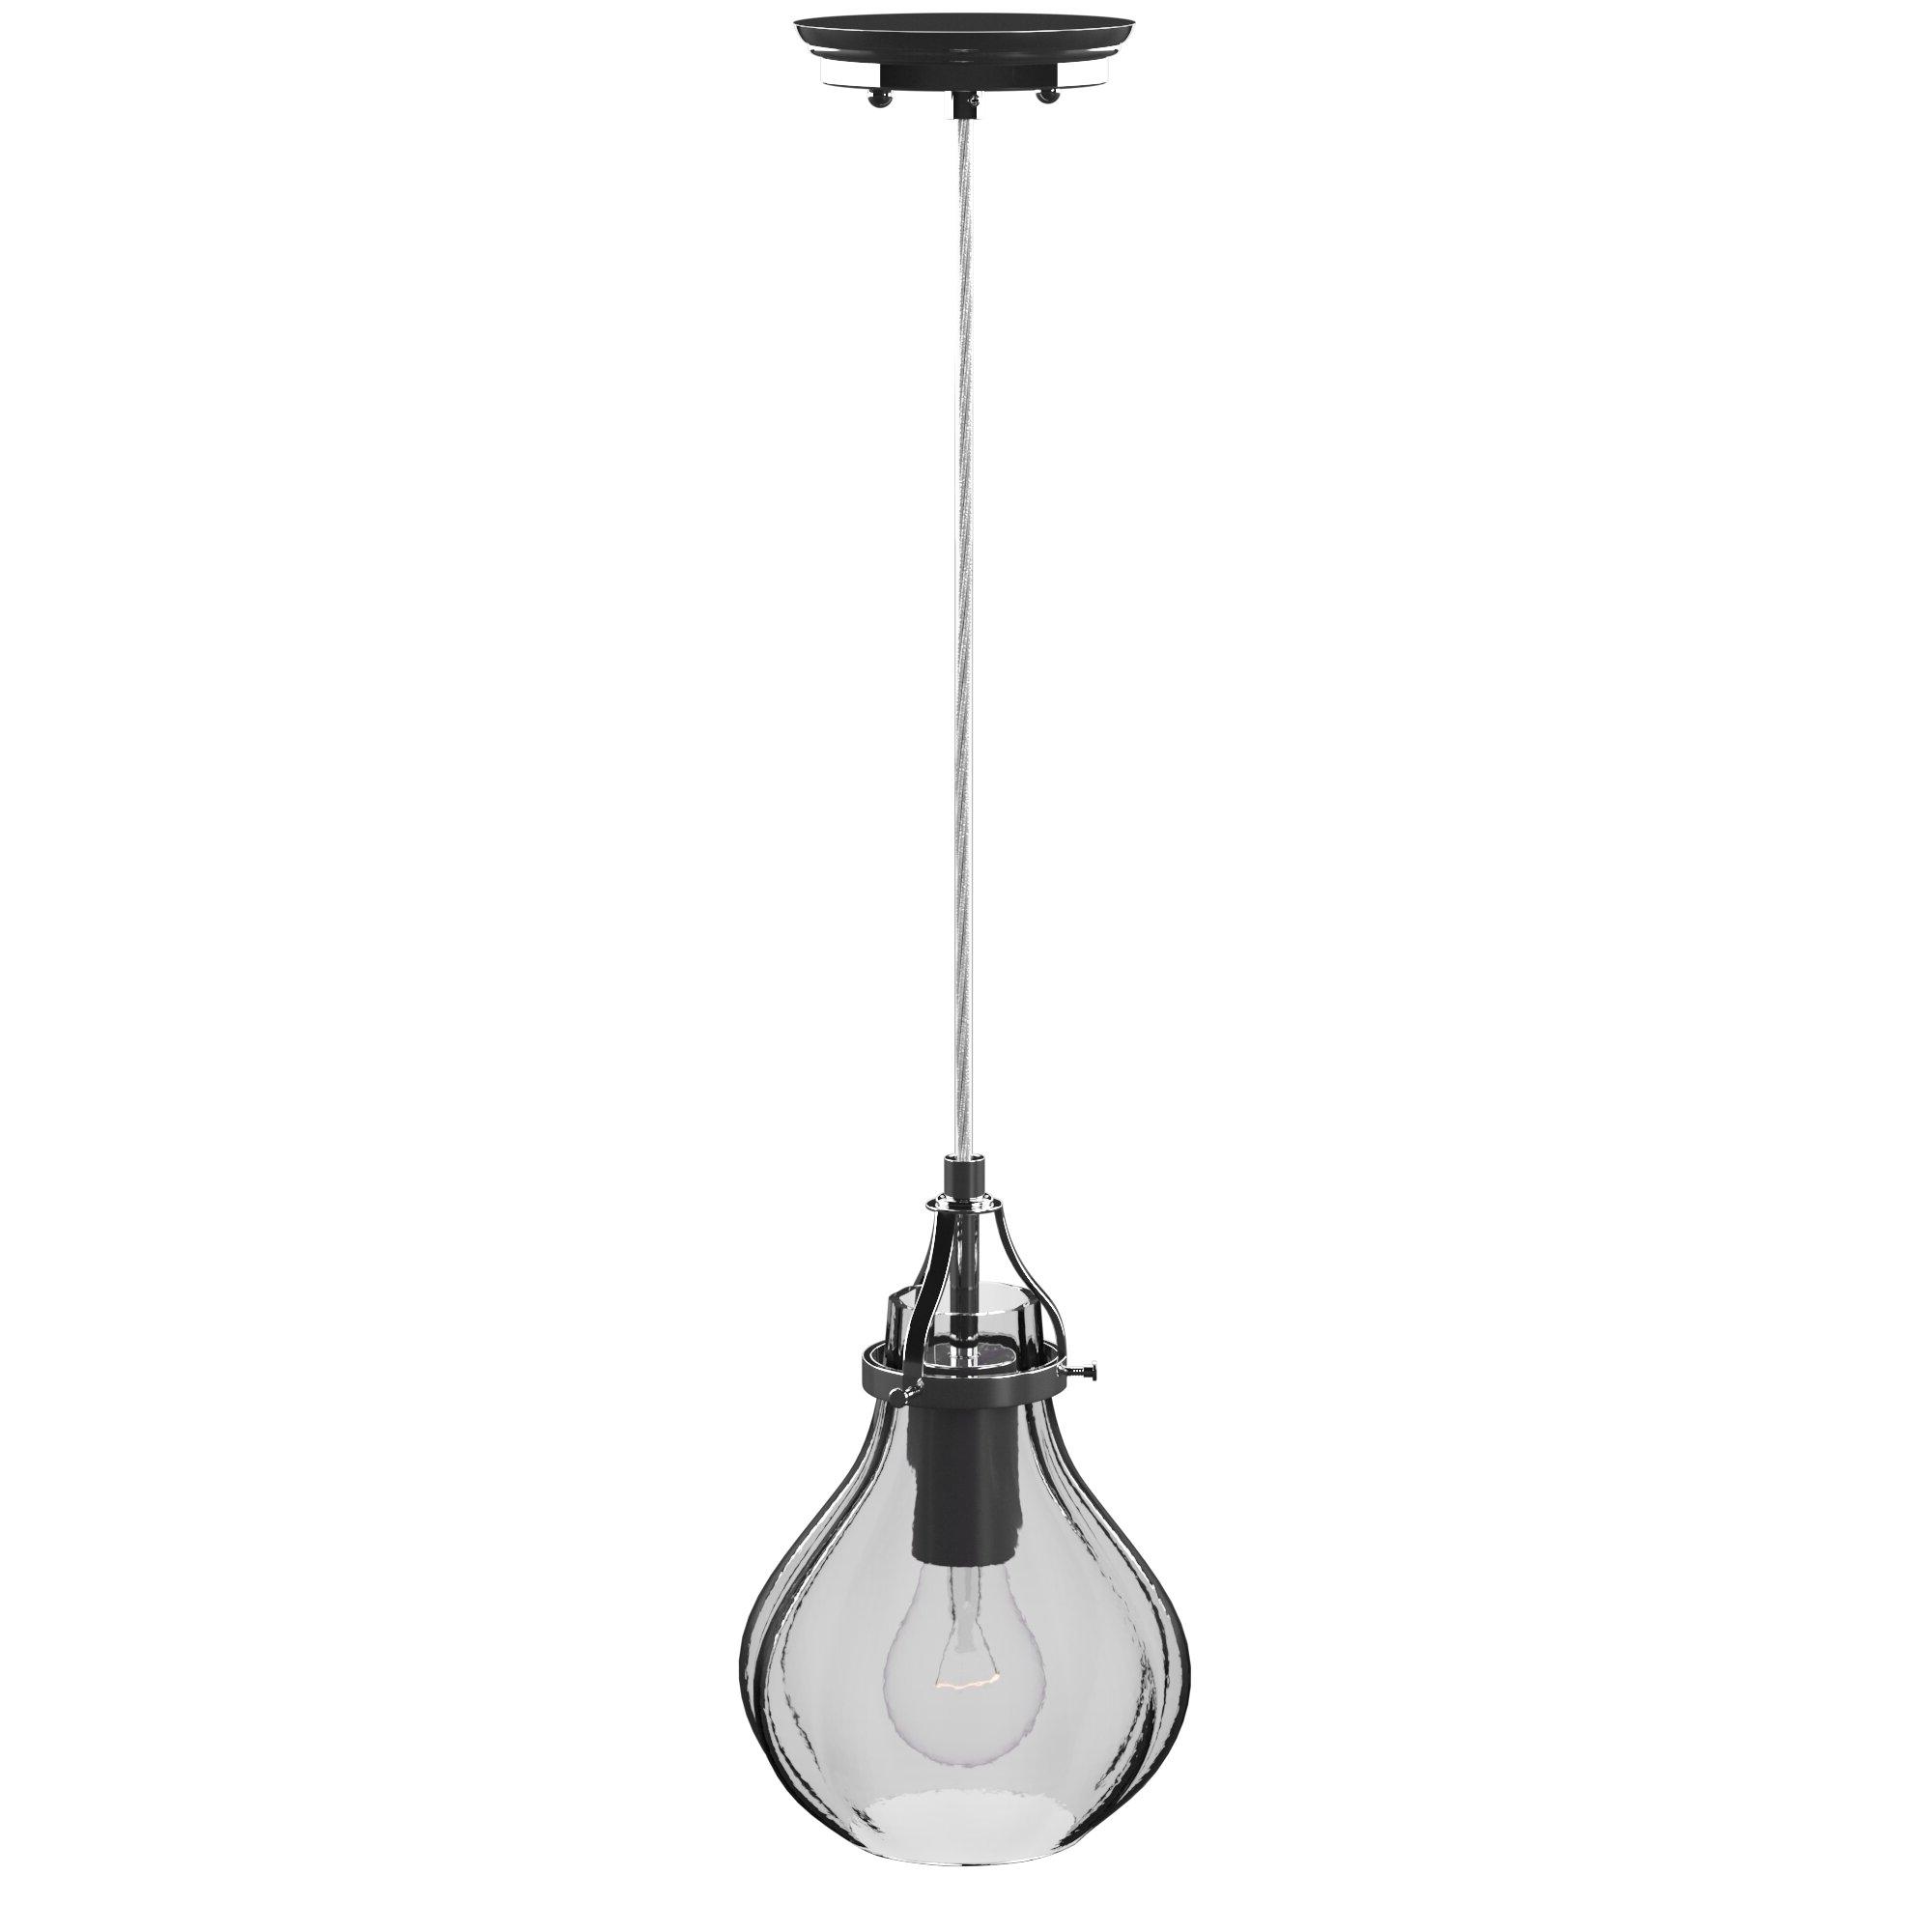 Most Recent 1 Light Single Teardrop Pendants Inside Orofino 1 Light Single Teardrop Pendant (View 12 of 20)